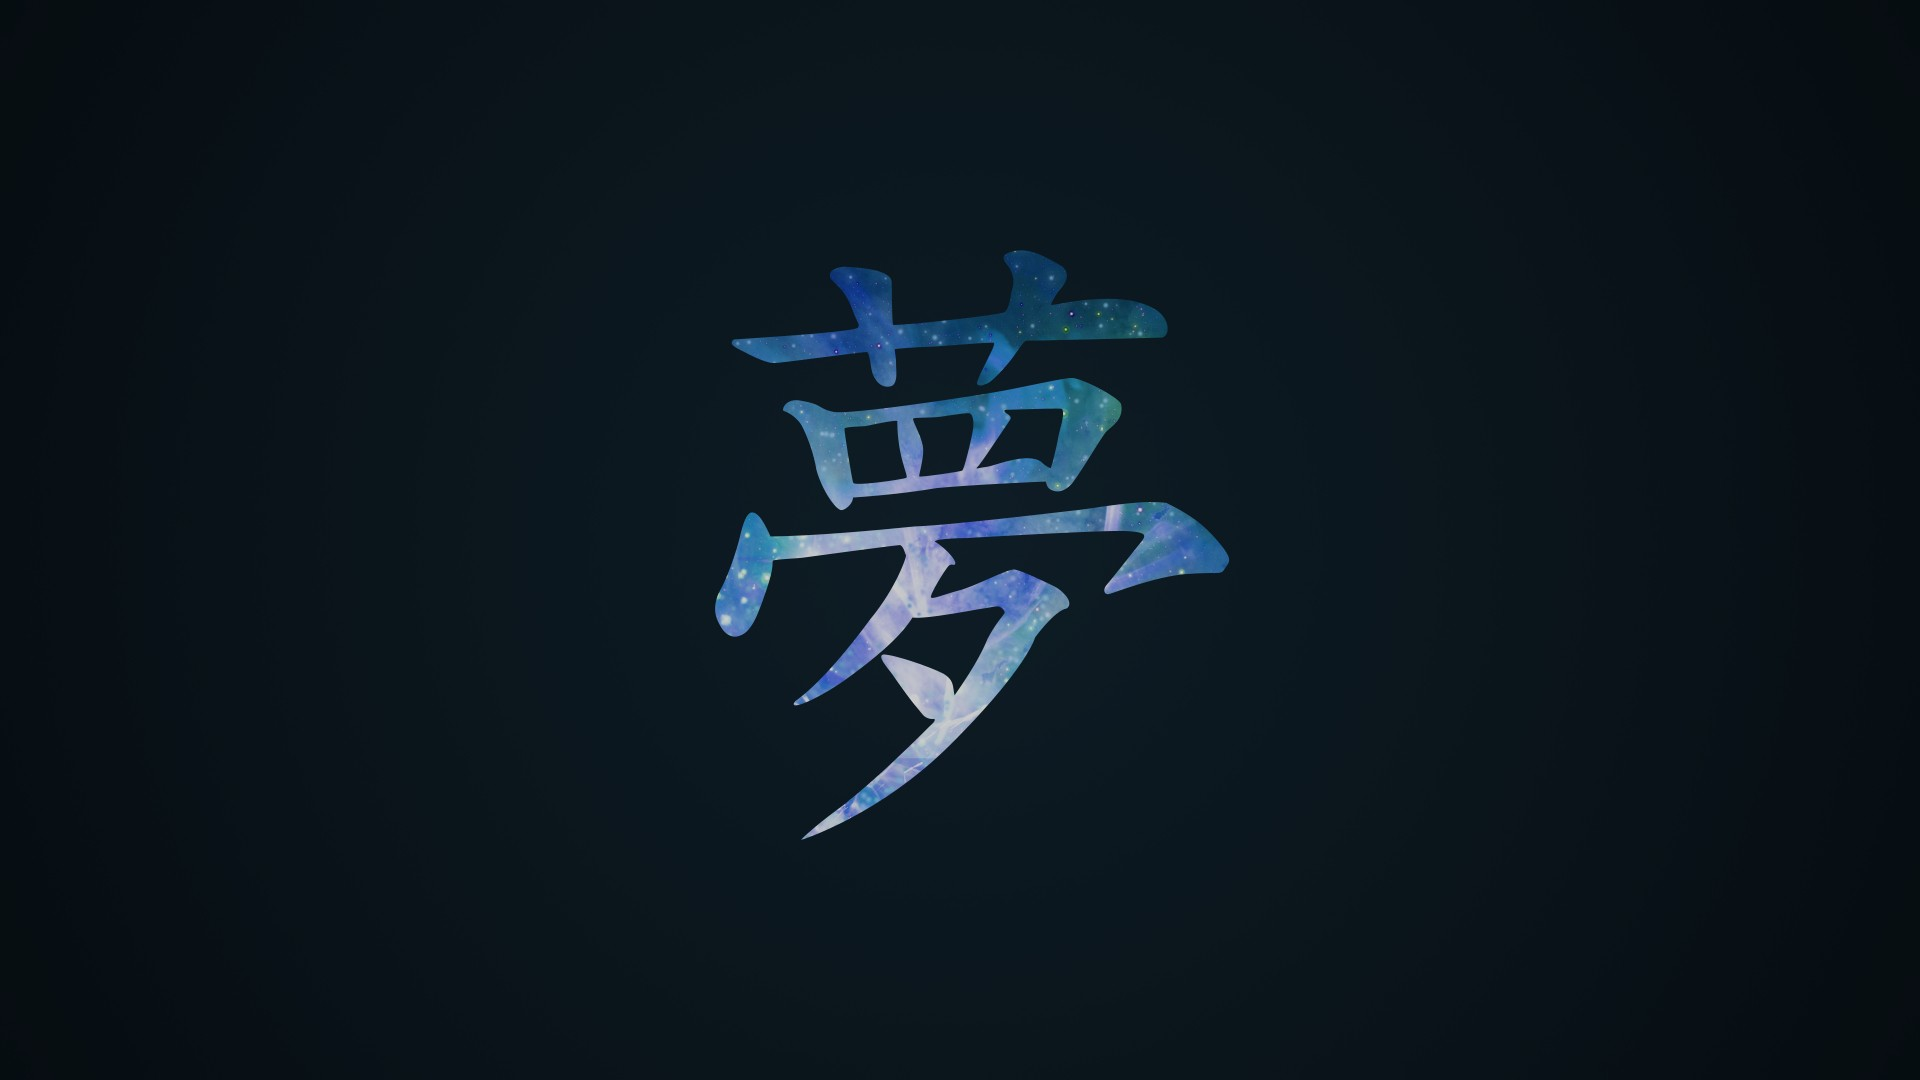 symbol chinese wallpaper | 1920x1080 | 213041 | wallpaperup